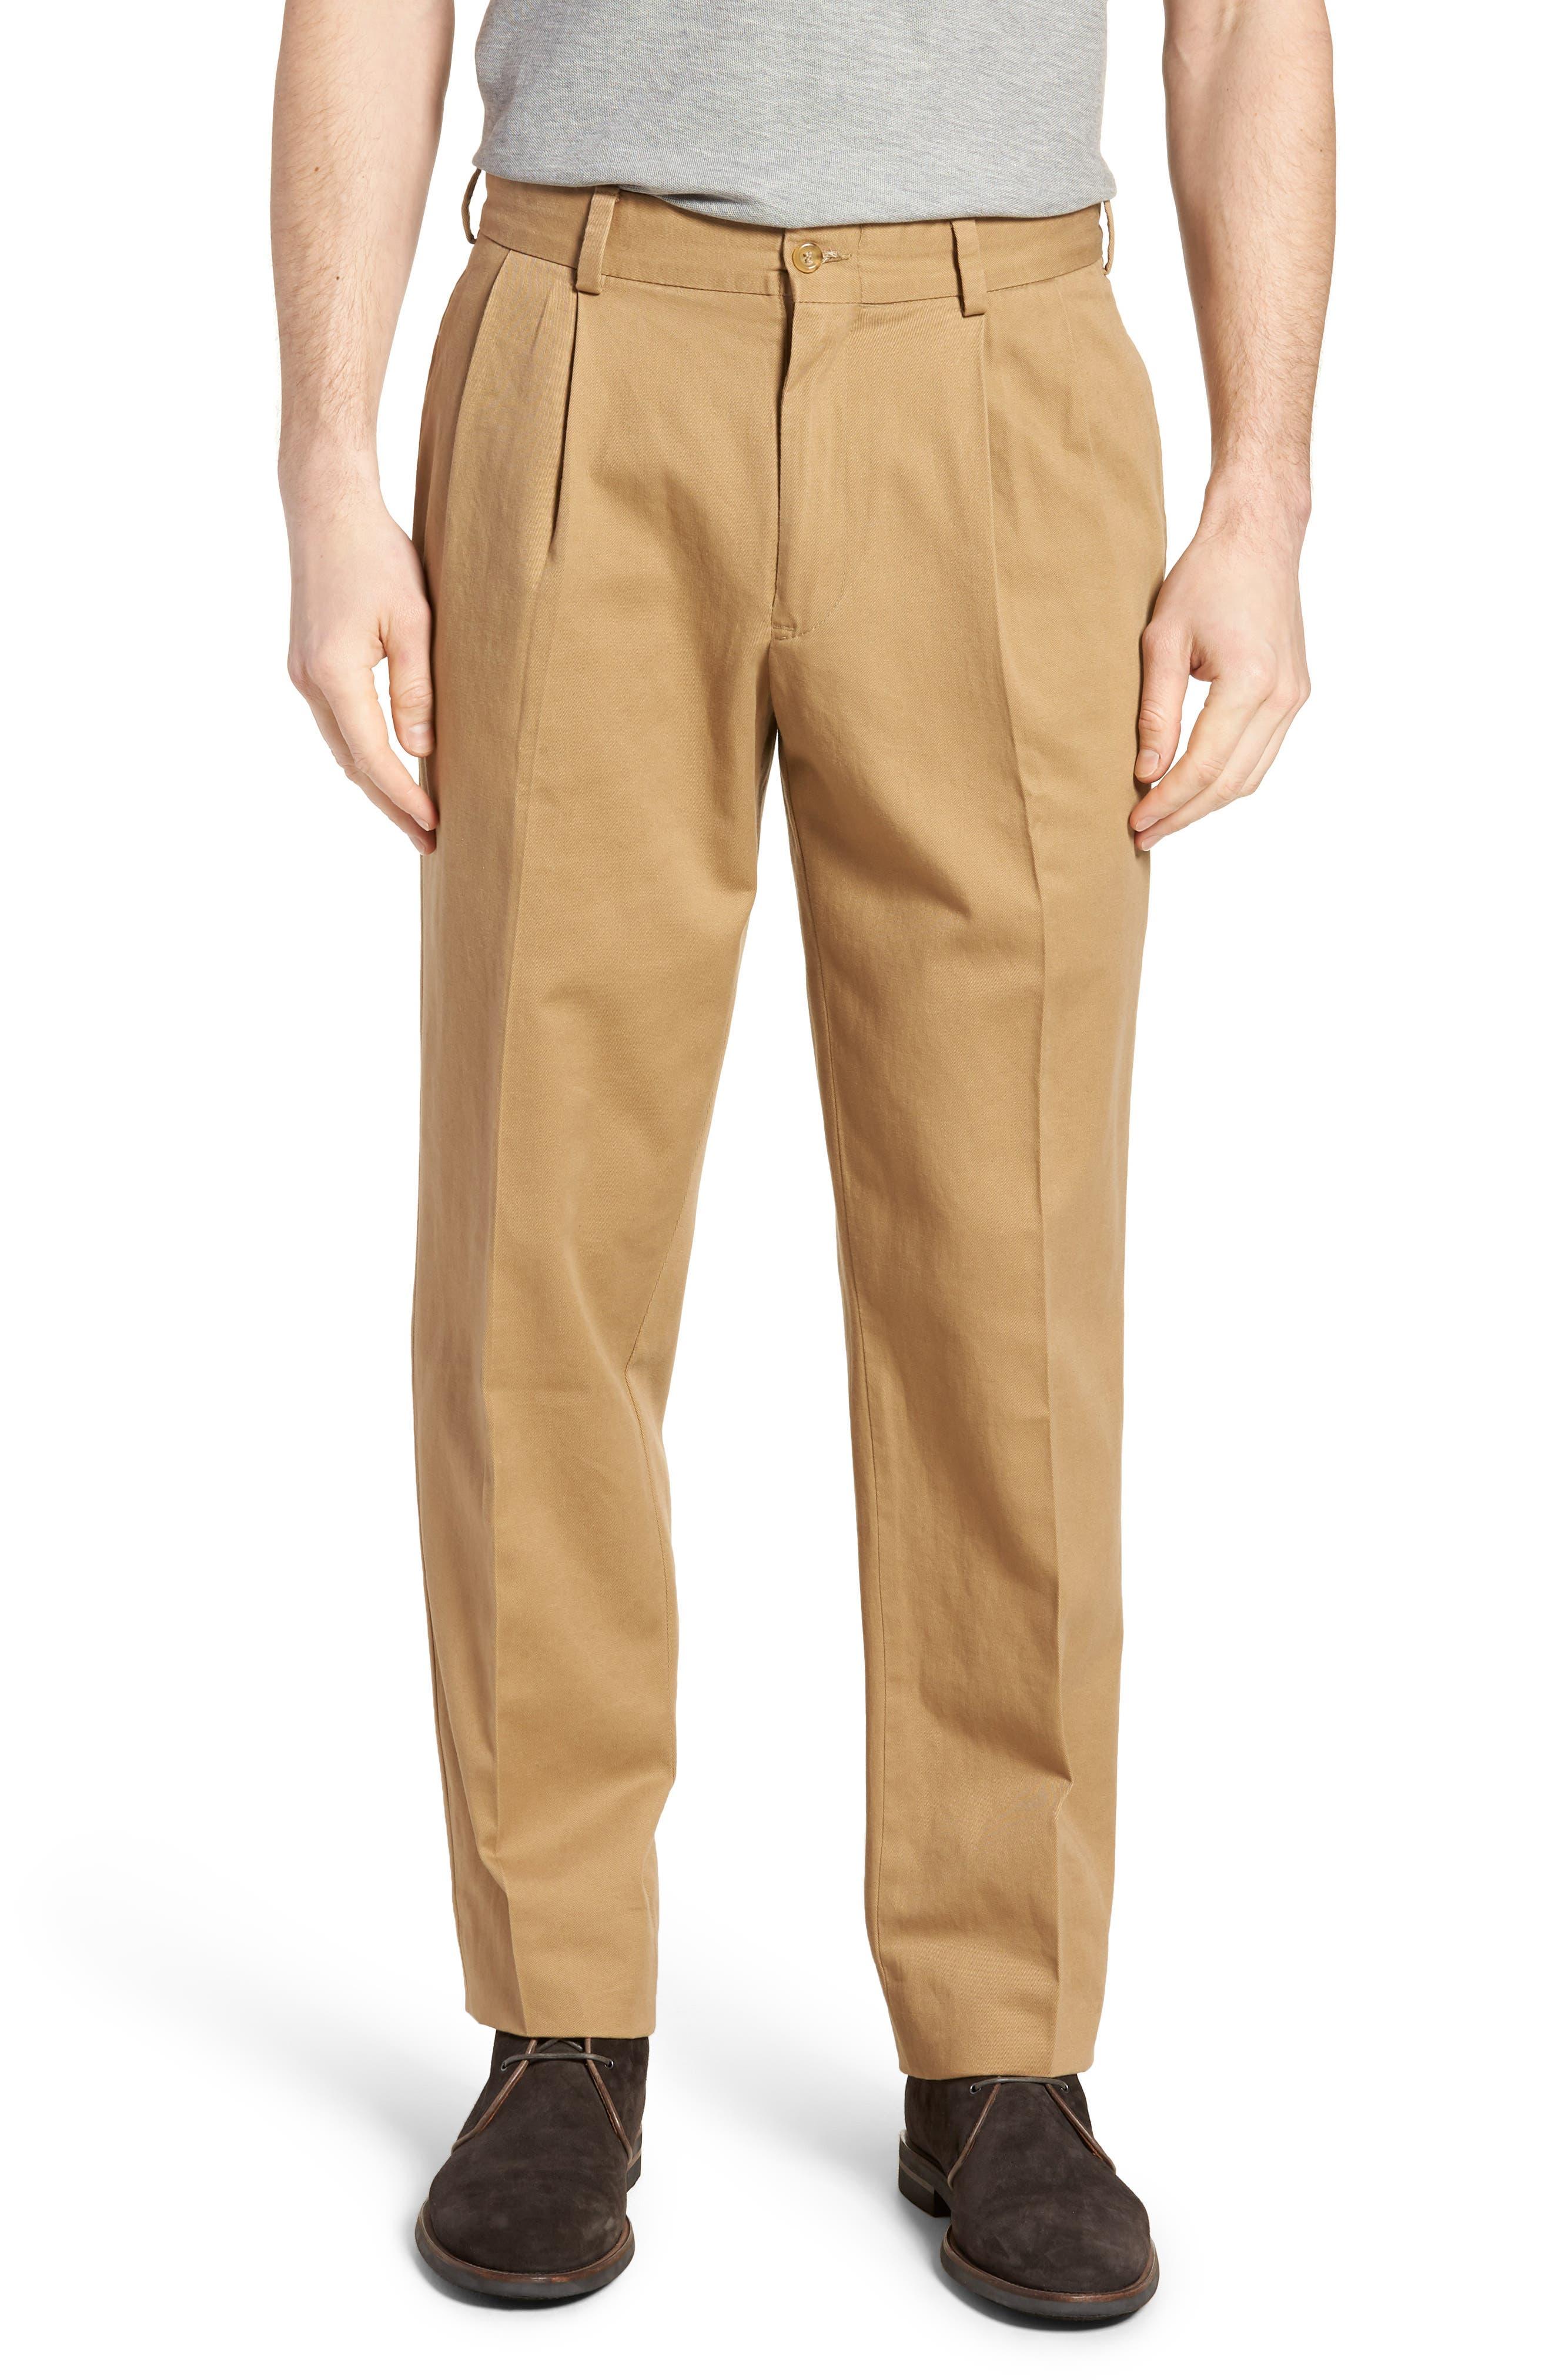 1950s Style Men S Pants Trousers Rockabilly Jeans